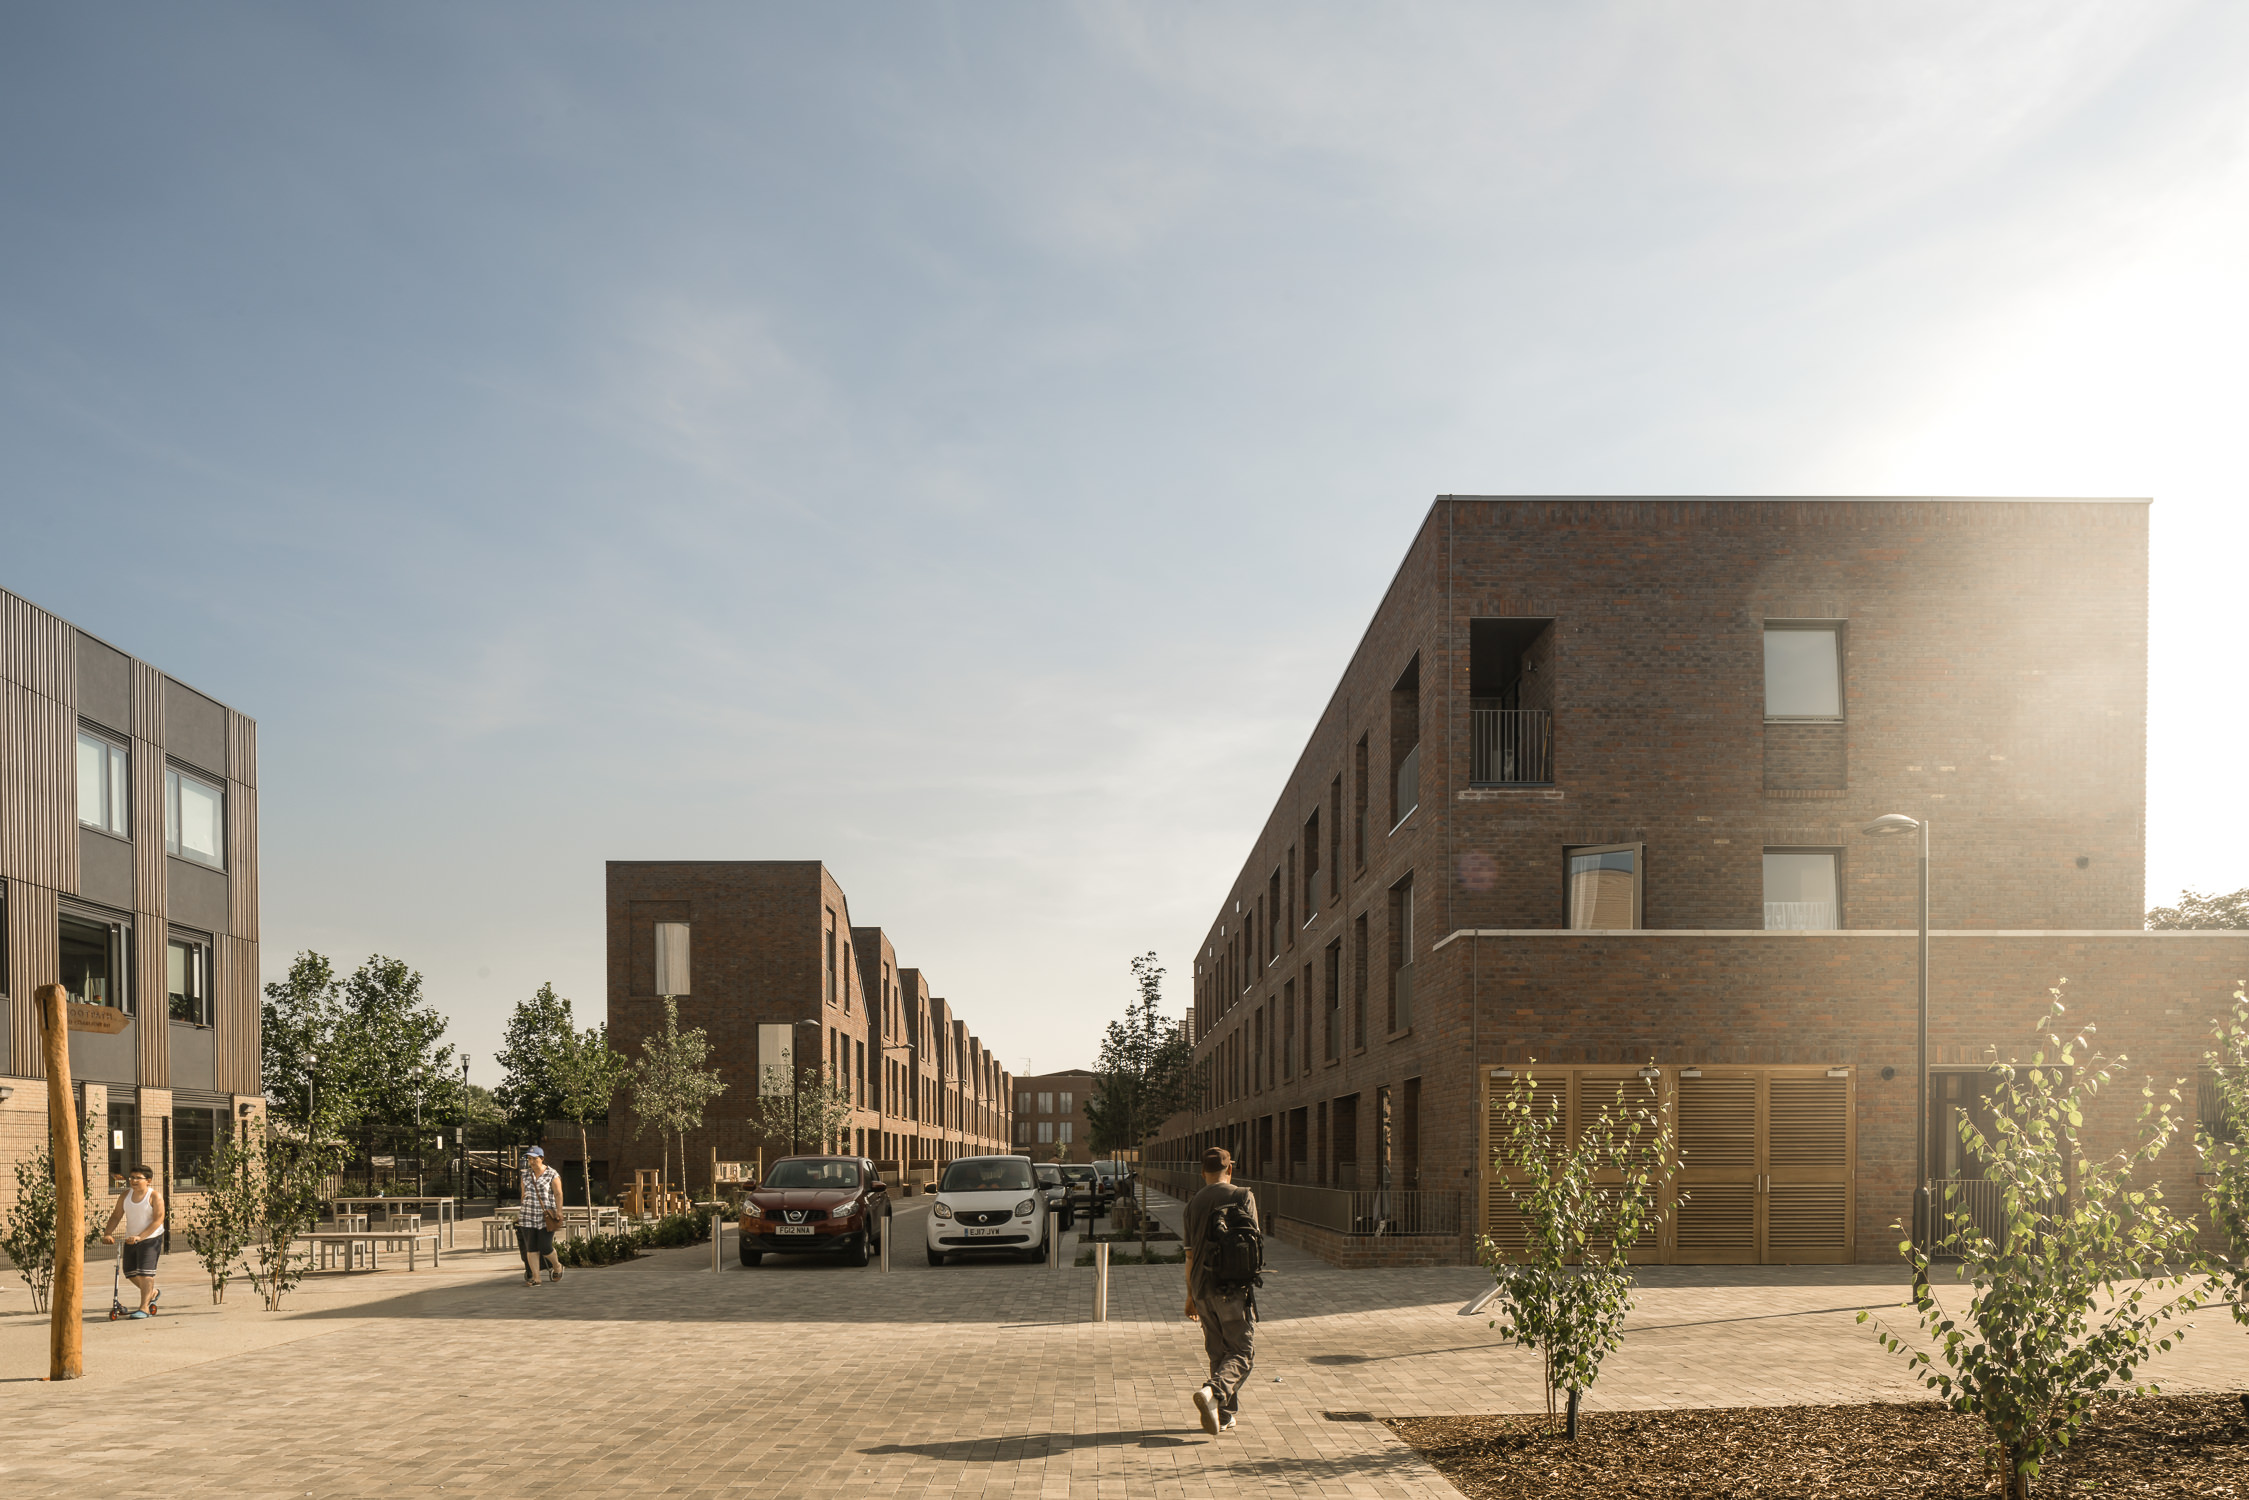 mark-hadden-architecture-photographer-architectuur-interieur-fotografie-london-amsterdam-Dujardin-Mews-165.jpg